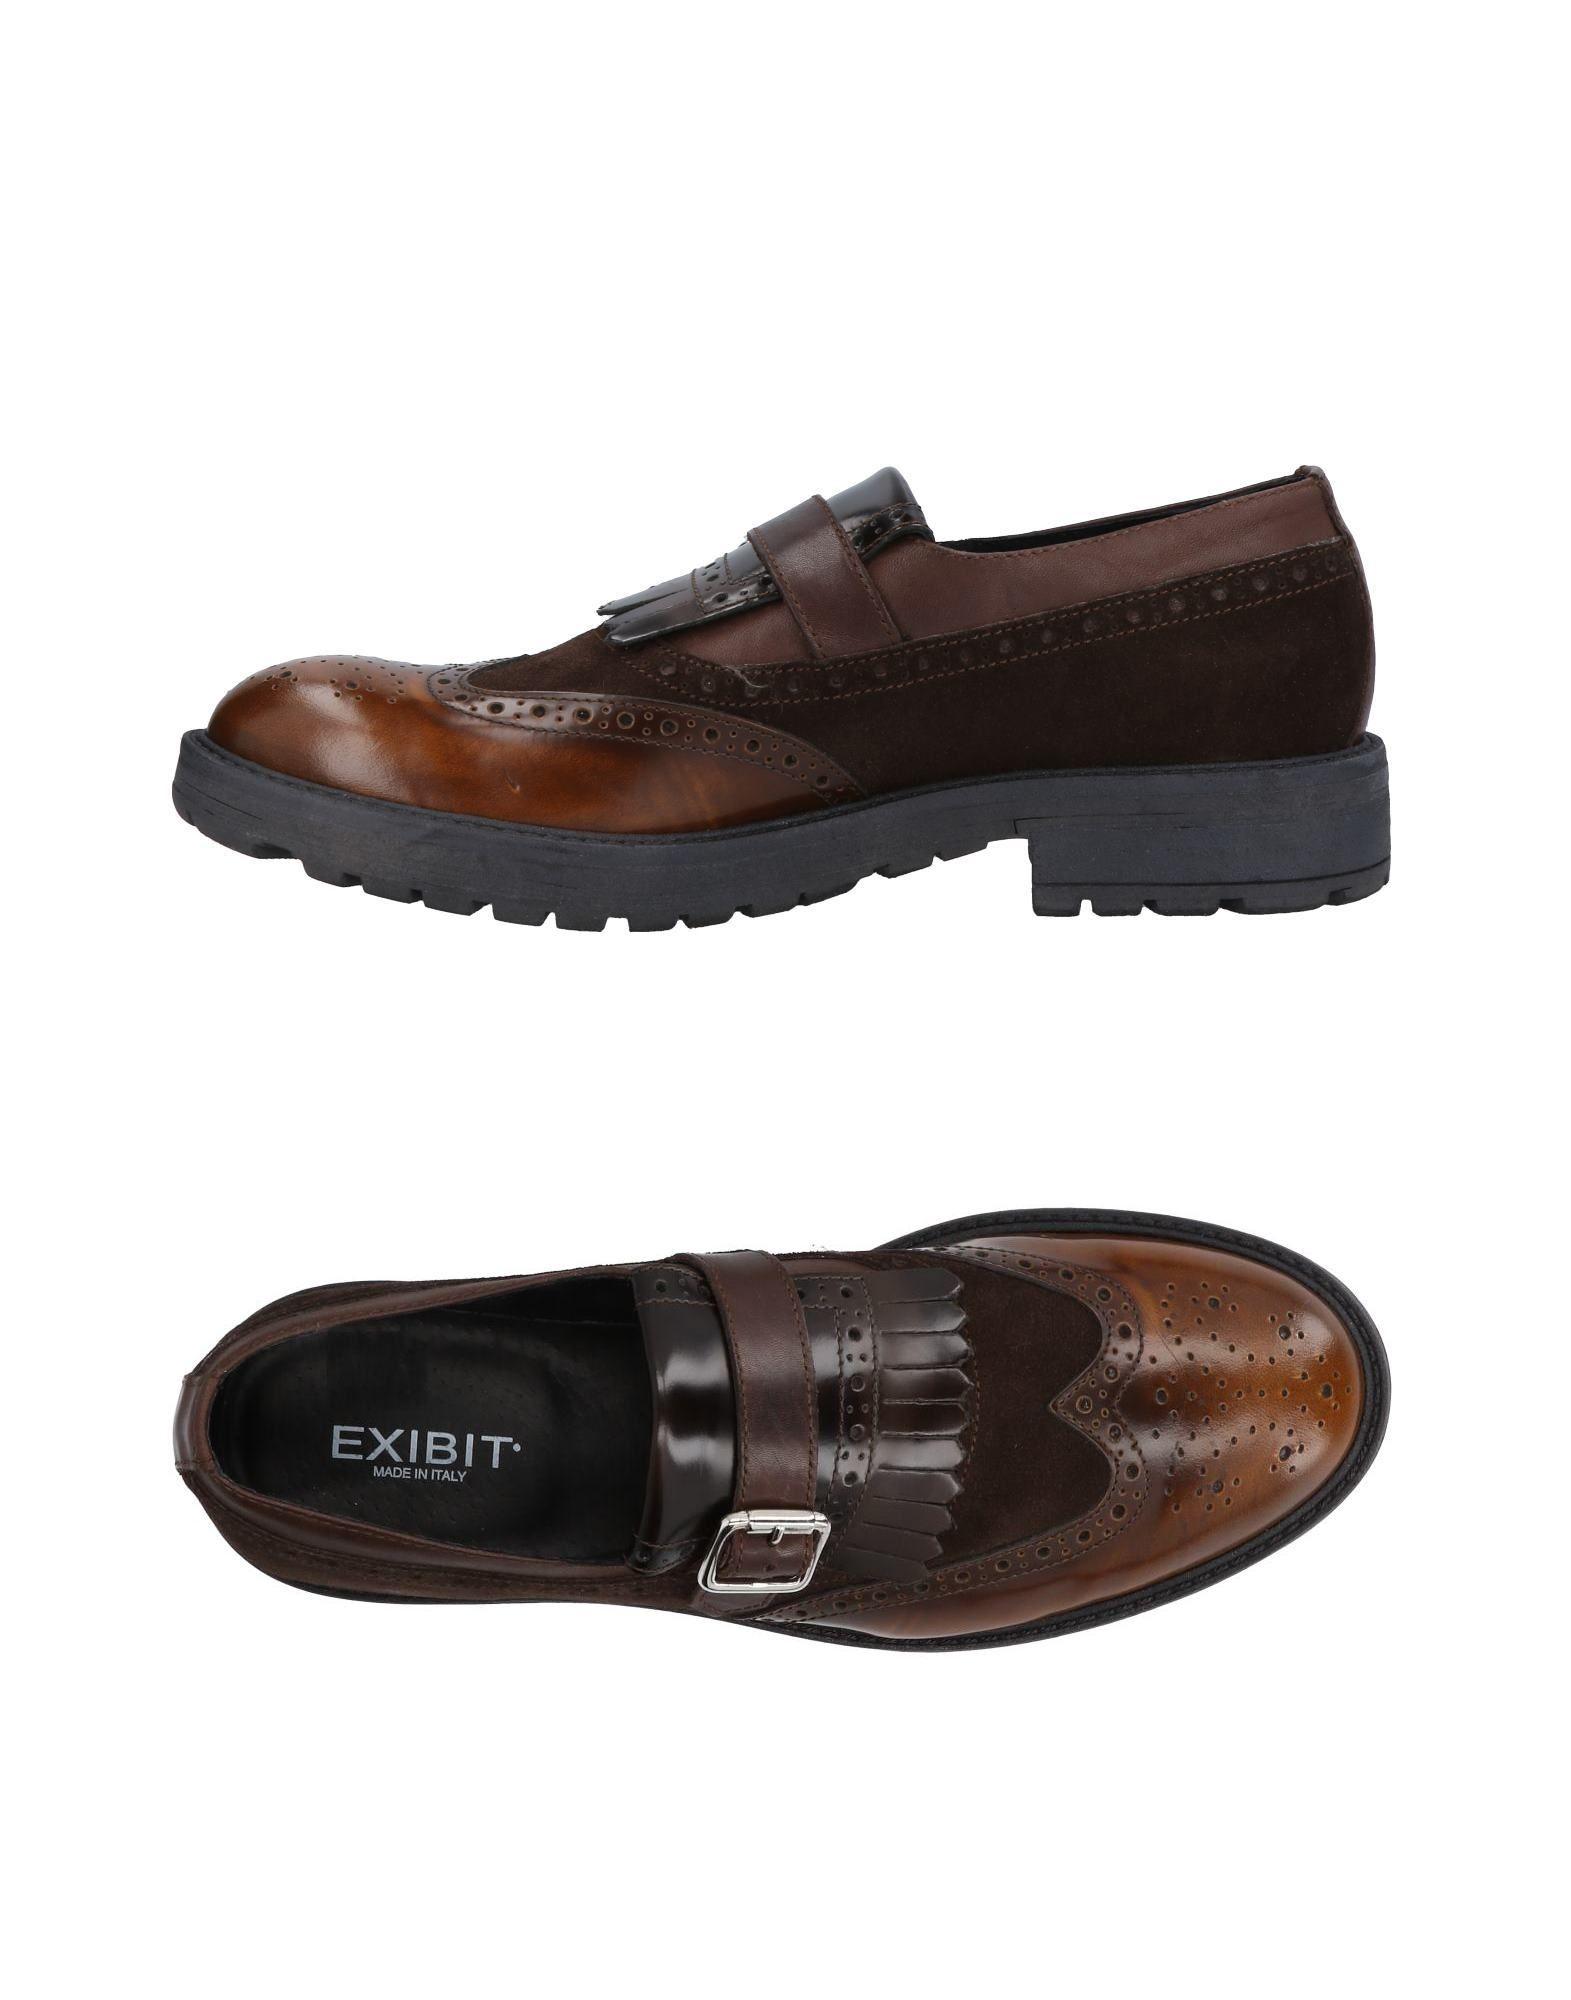 Exibit on Loafers - Men Exibit Loafers online on Exibit  Australia - 11465315LE 576c6b